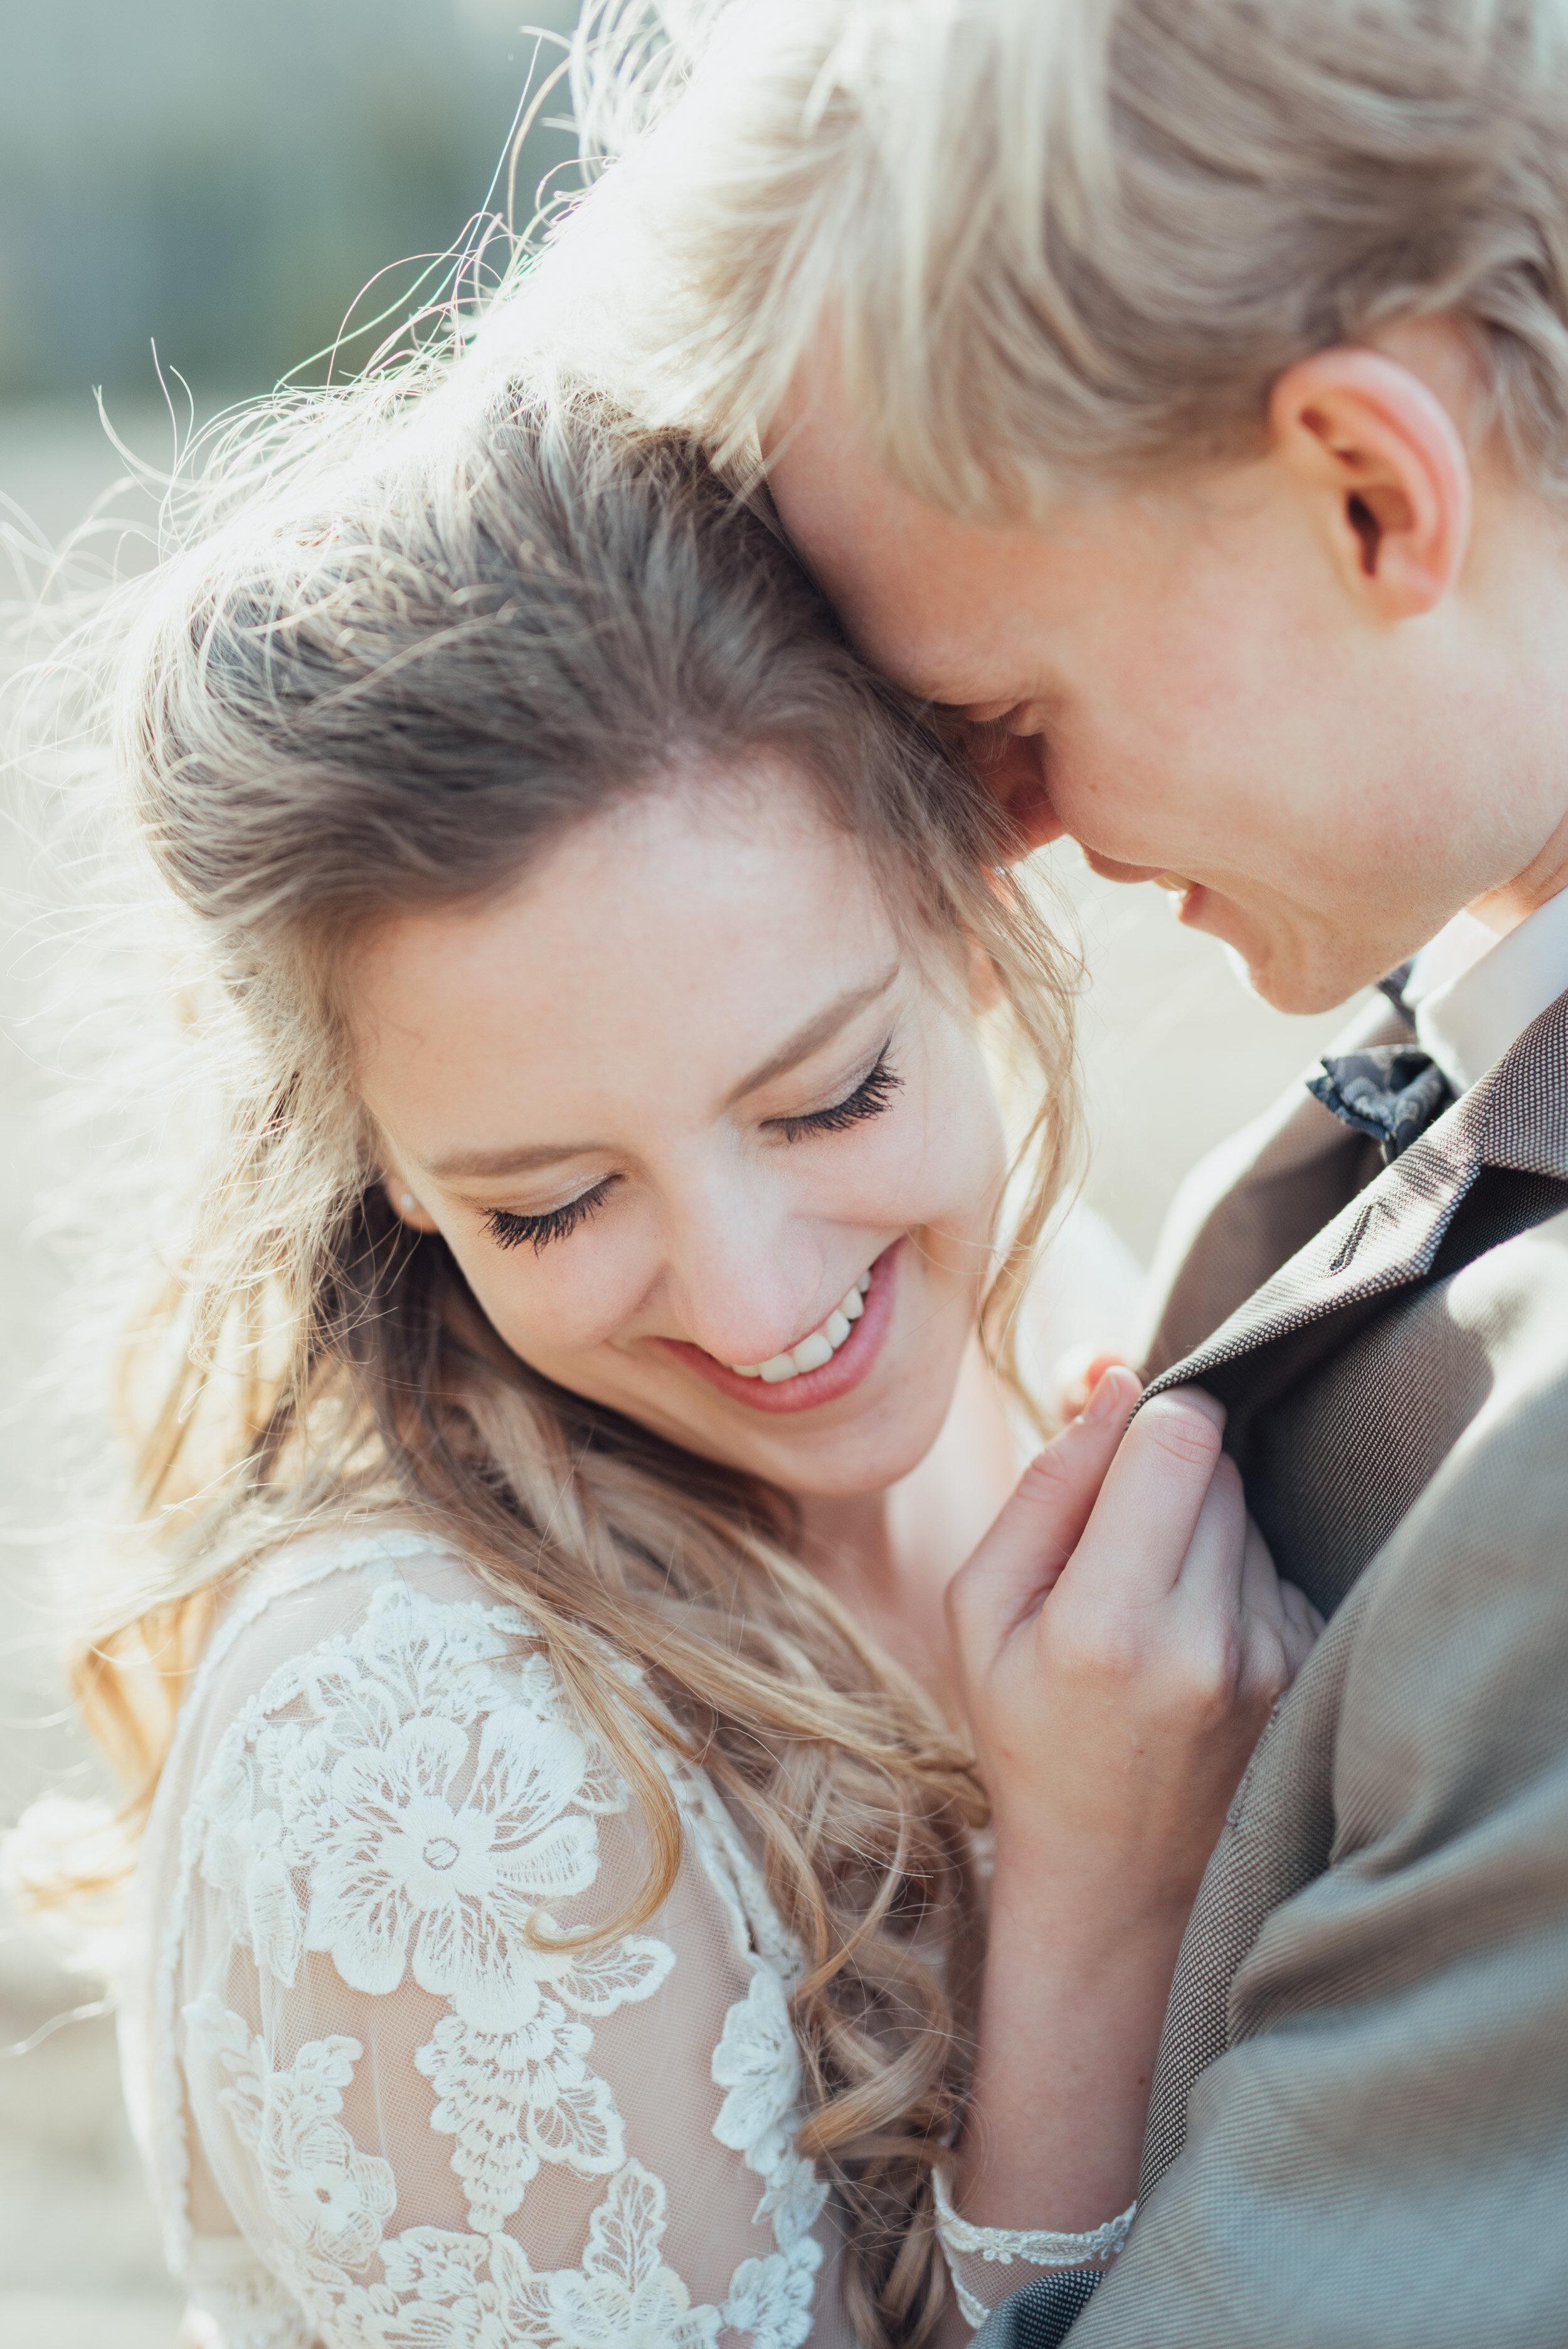 cleland-fine-art-wedding-photography-18.jpg